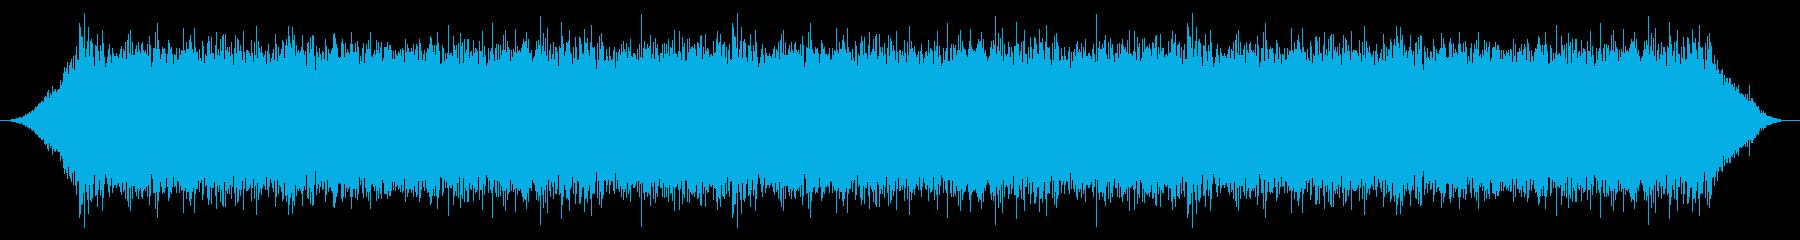 PC 駆動音01-08(ロング)の再生済みの波形